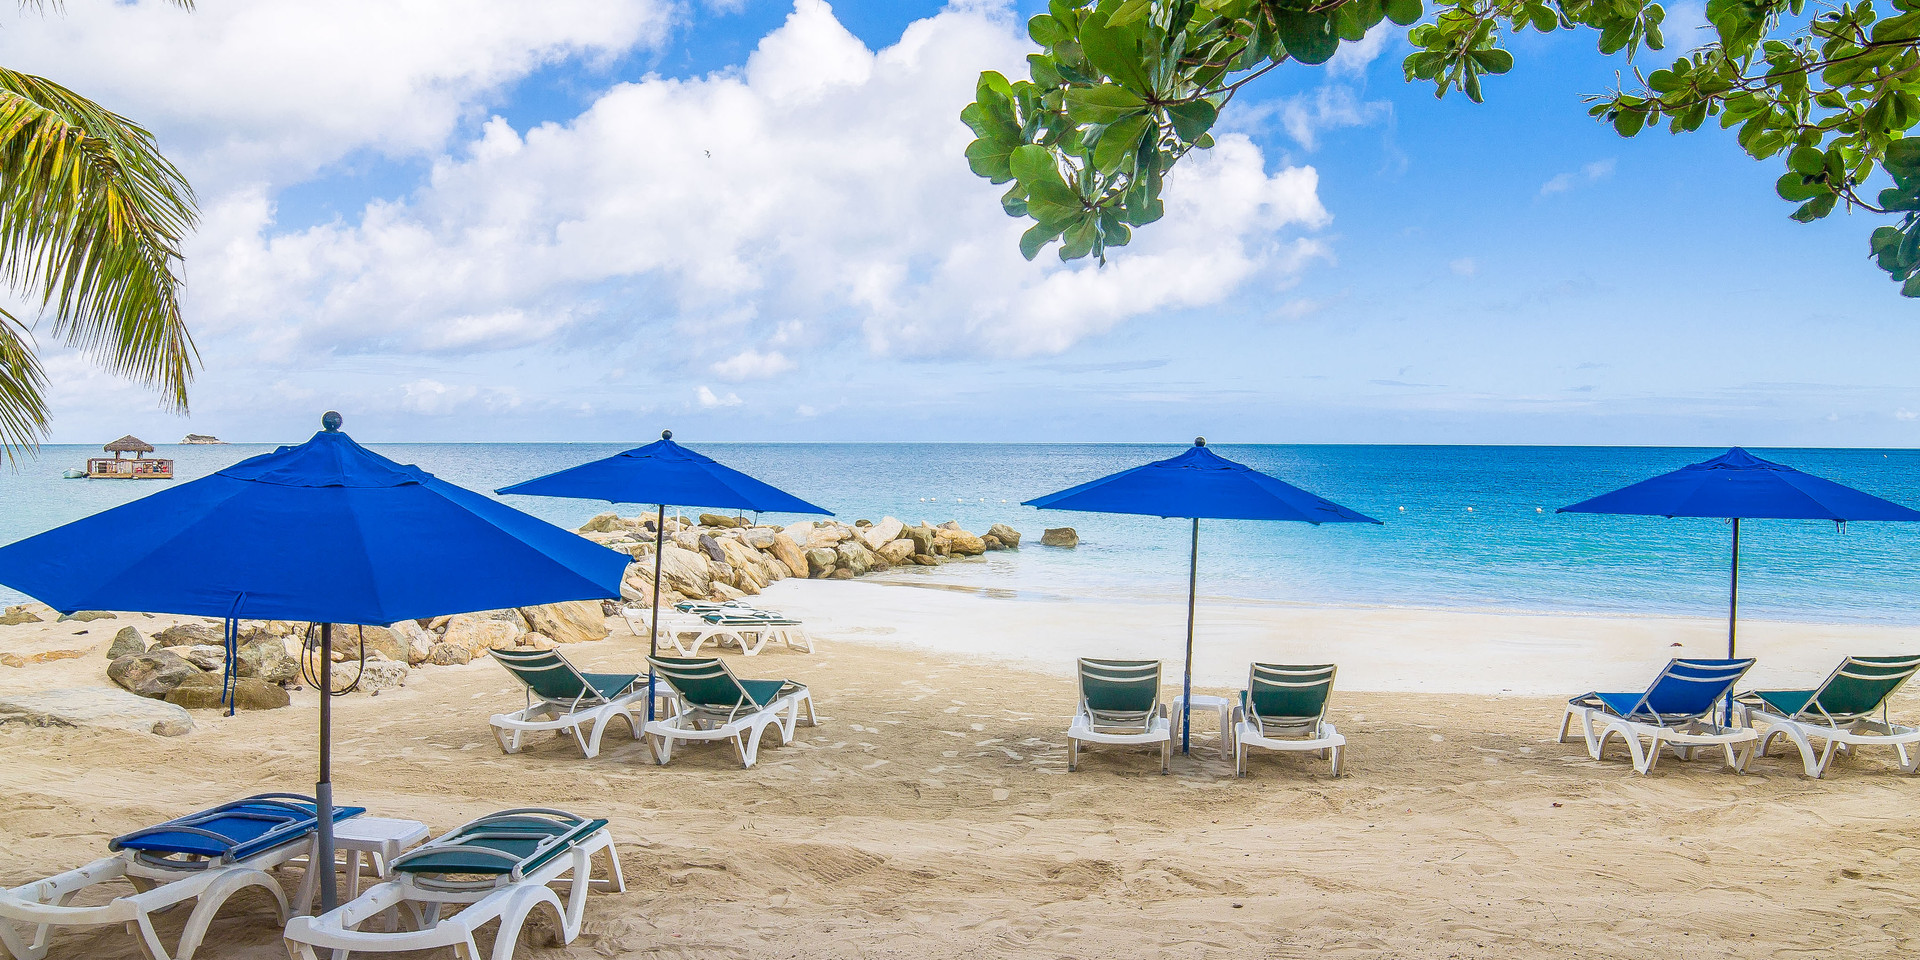 20190509-Buccaneer Beach Club photoshoot